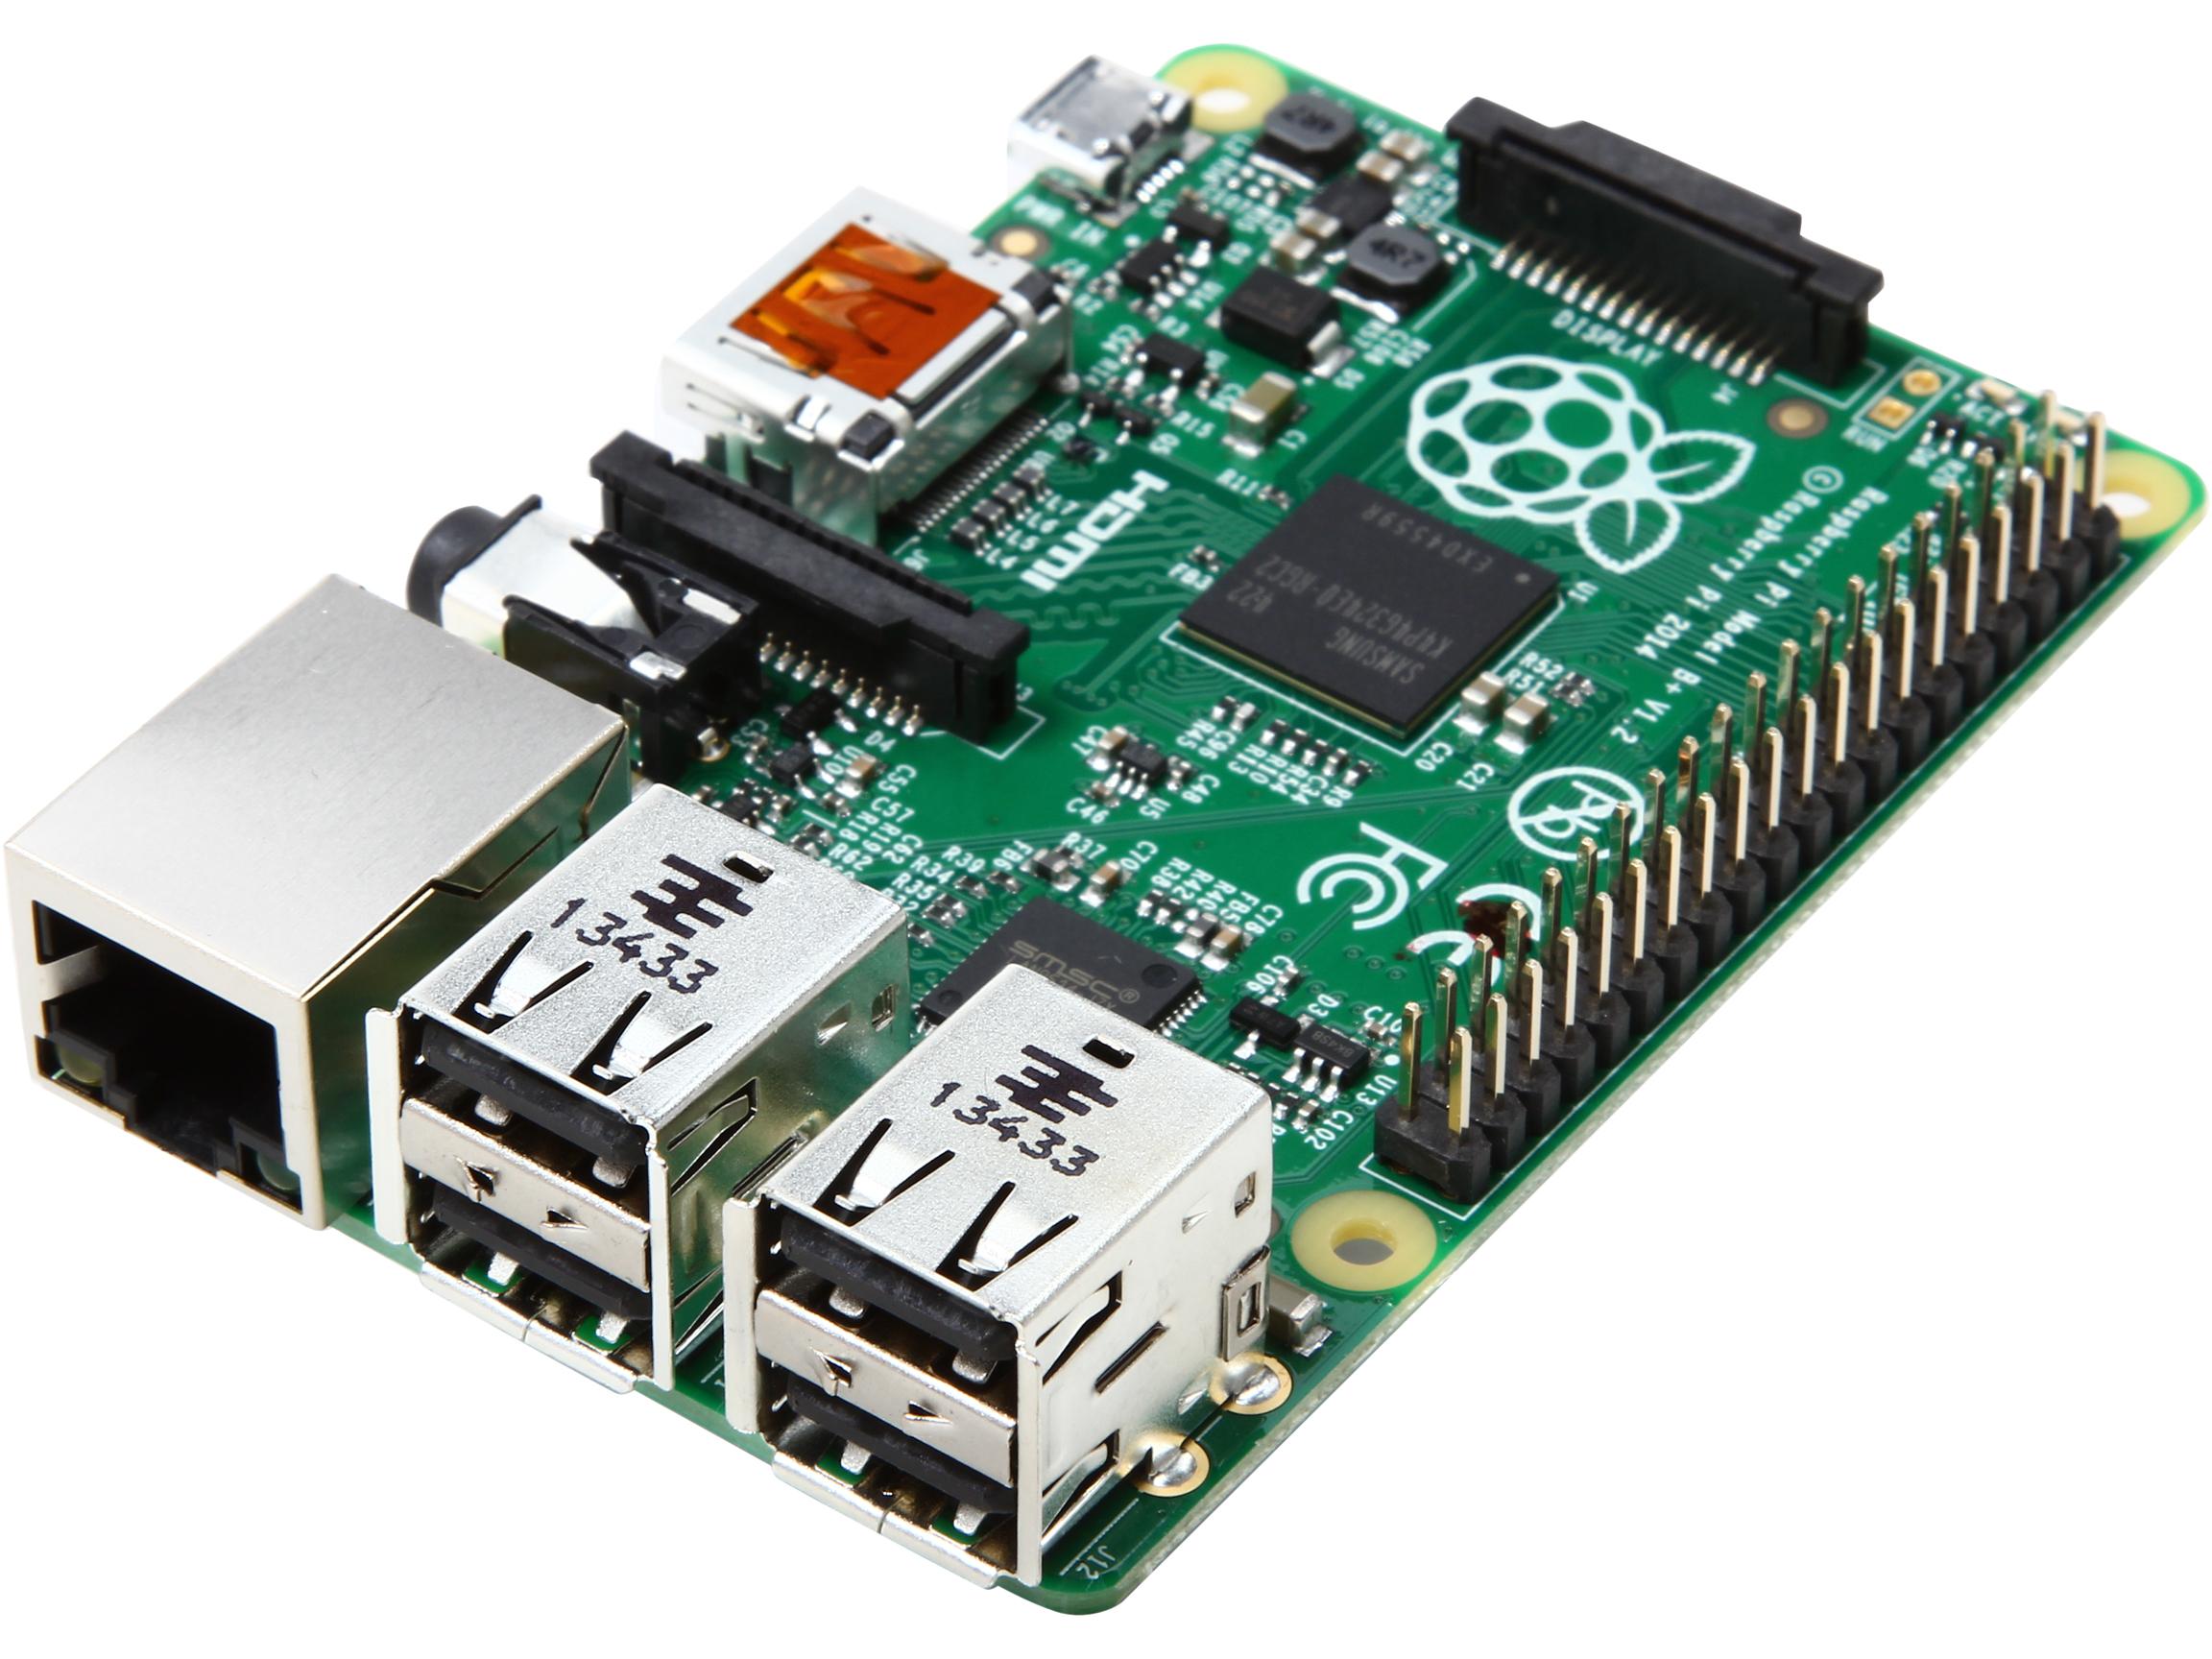 Raspberry Pi B Broadcom Bcm2835 Soc Arm11 700 Mhz Low Power Diy Fiber Optic Intercom Electronic Projects Circuits Arm1176jzfs Applications Processor Motherboard Cpu Vga Combo